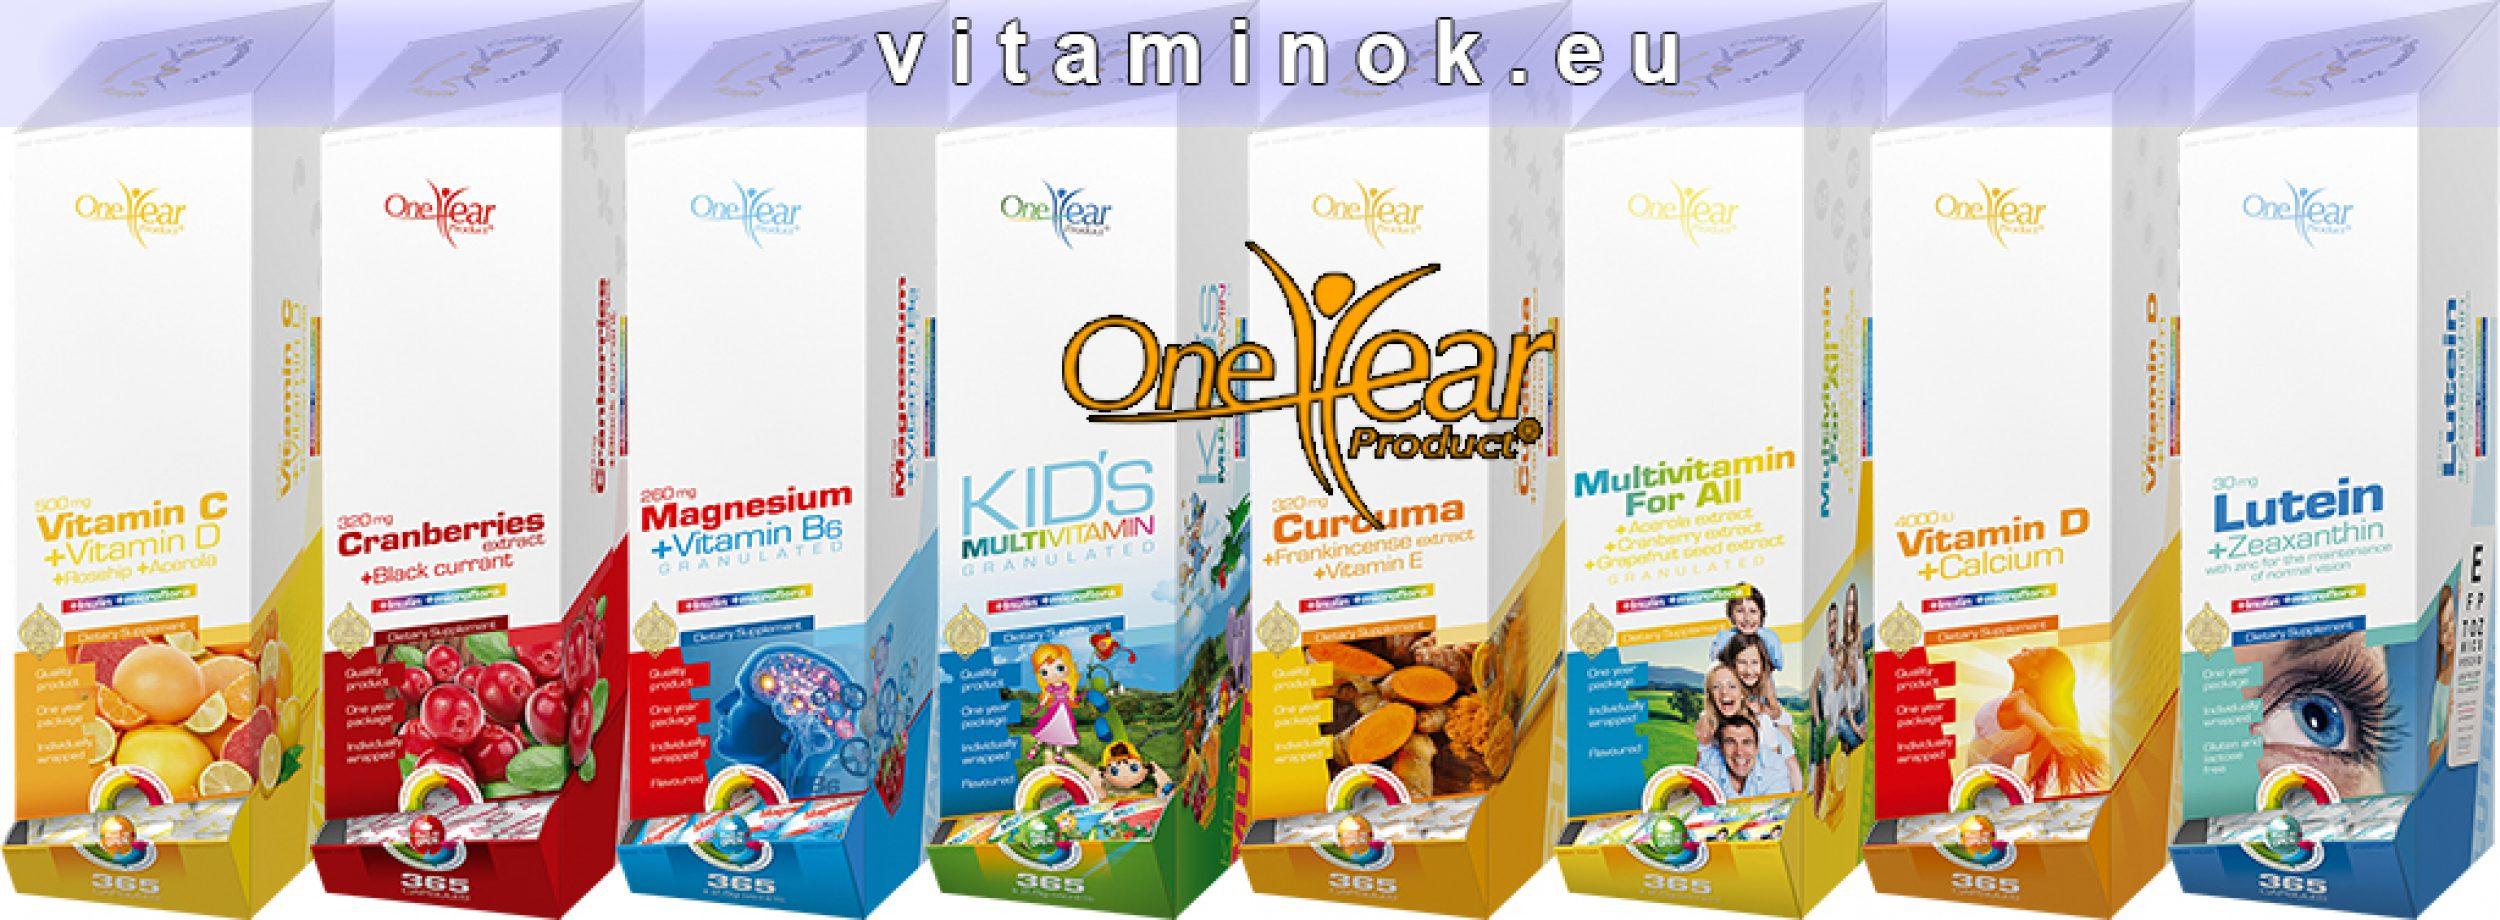 vitaminok.eu